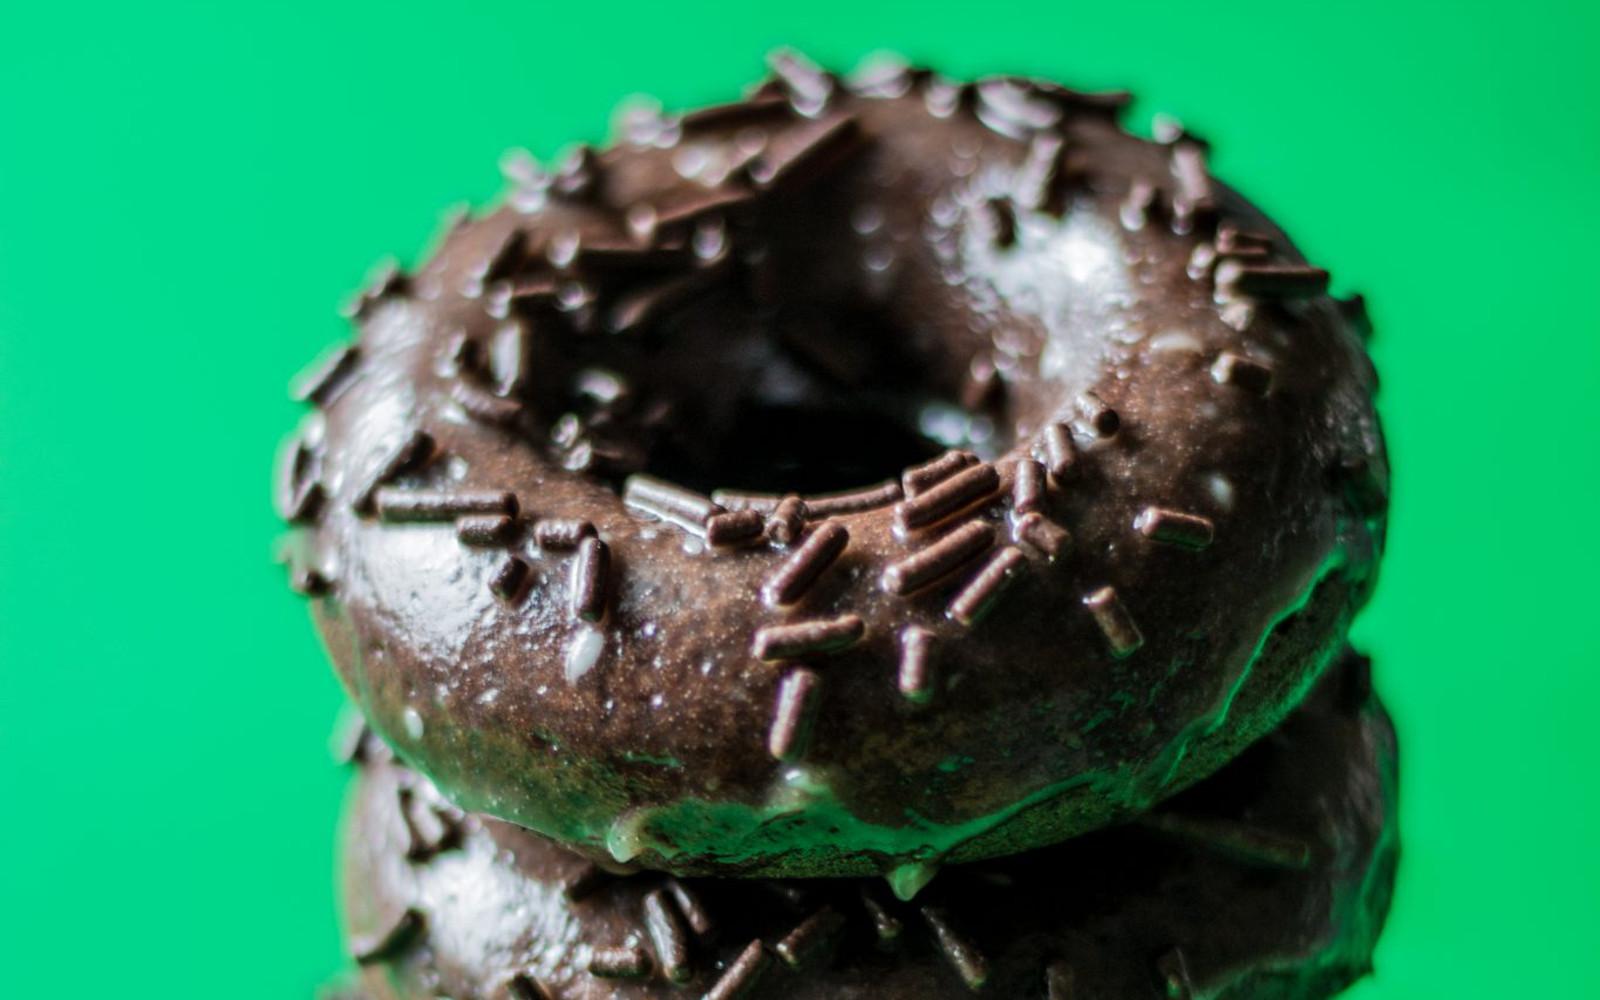 Vegan Easy Chocolate Doughnuts With Espresso Glaze and sprinkes